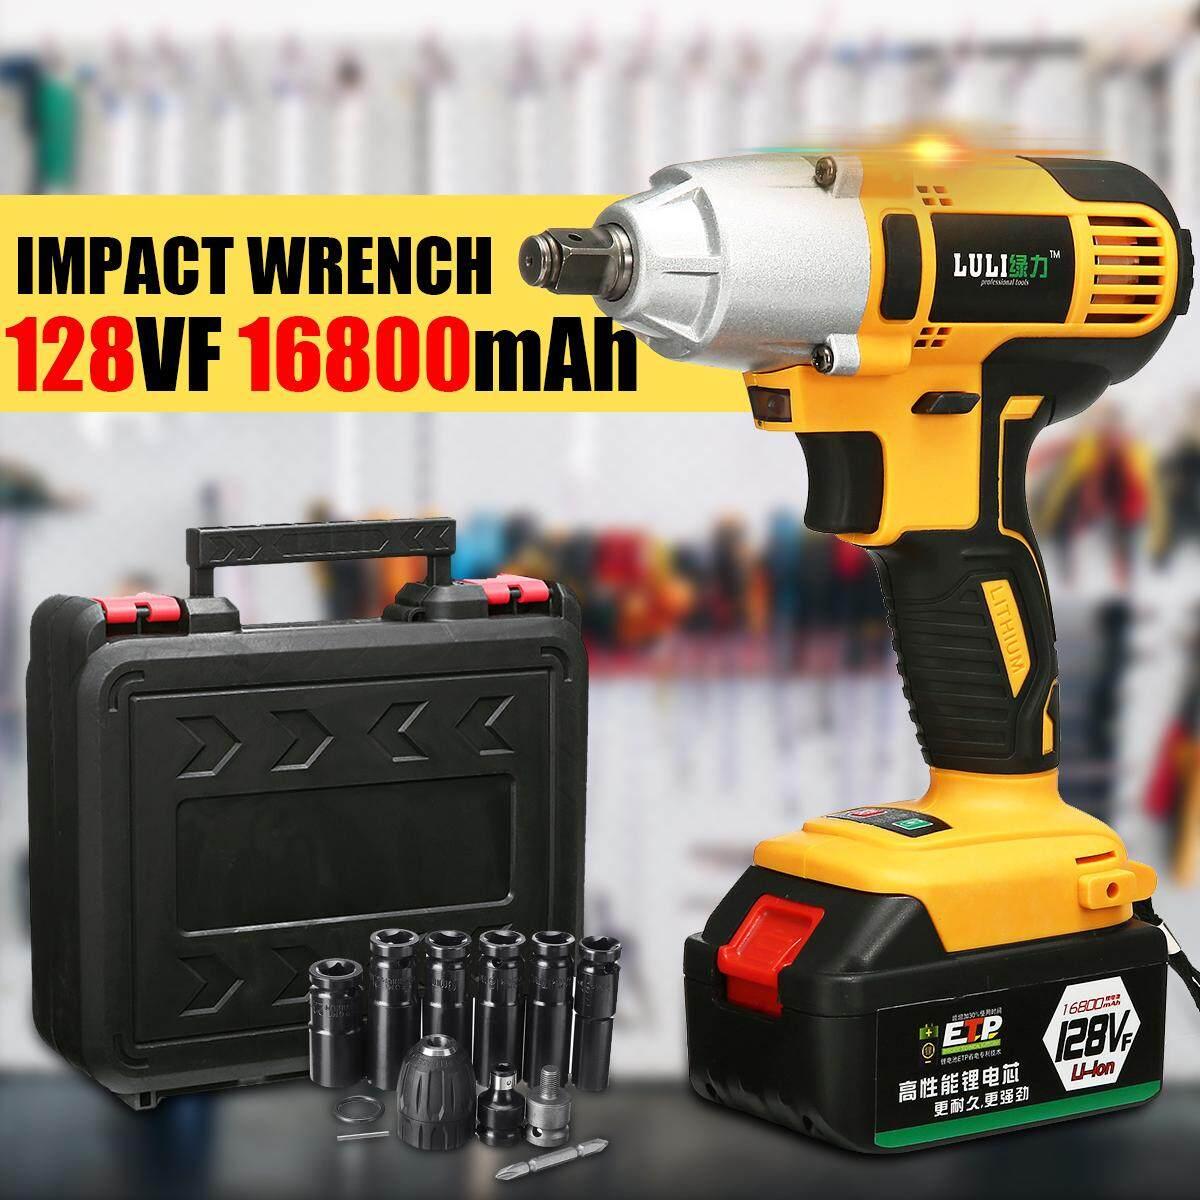 16800mAh 220V Cordless Impact Wrench Drill 1/2 Li-on Battery Driver DIY Tool